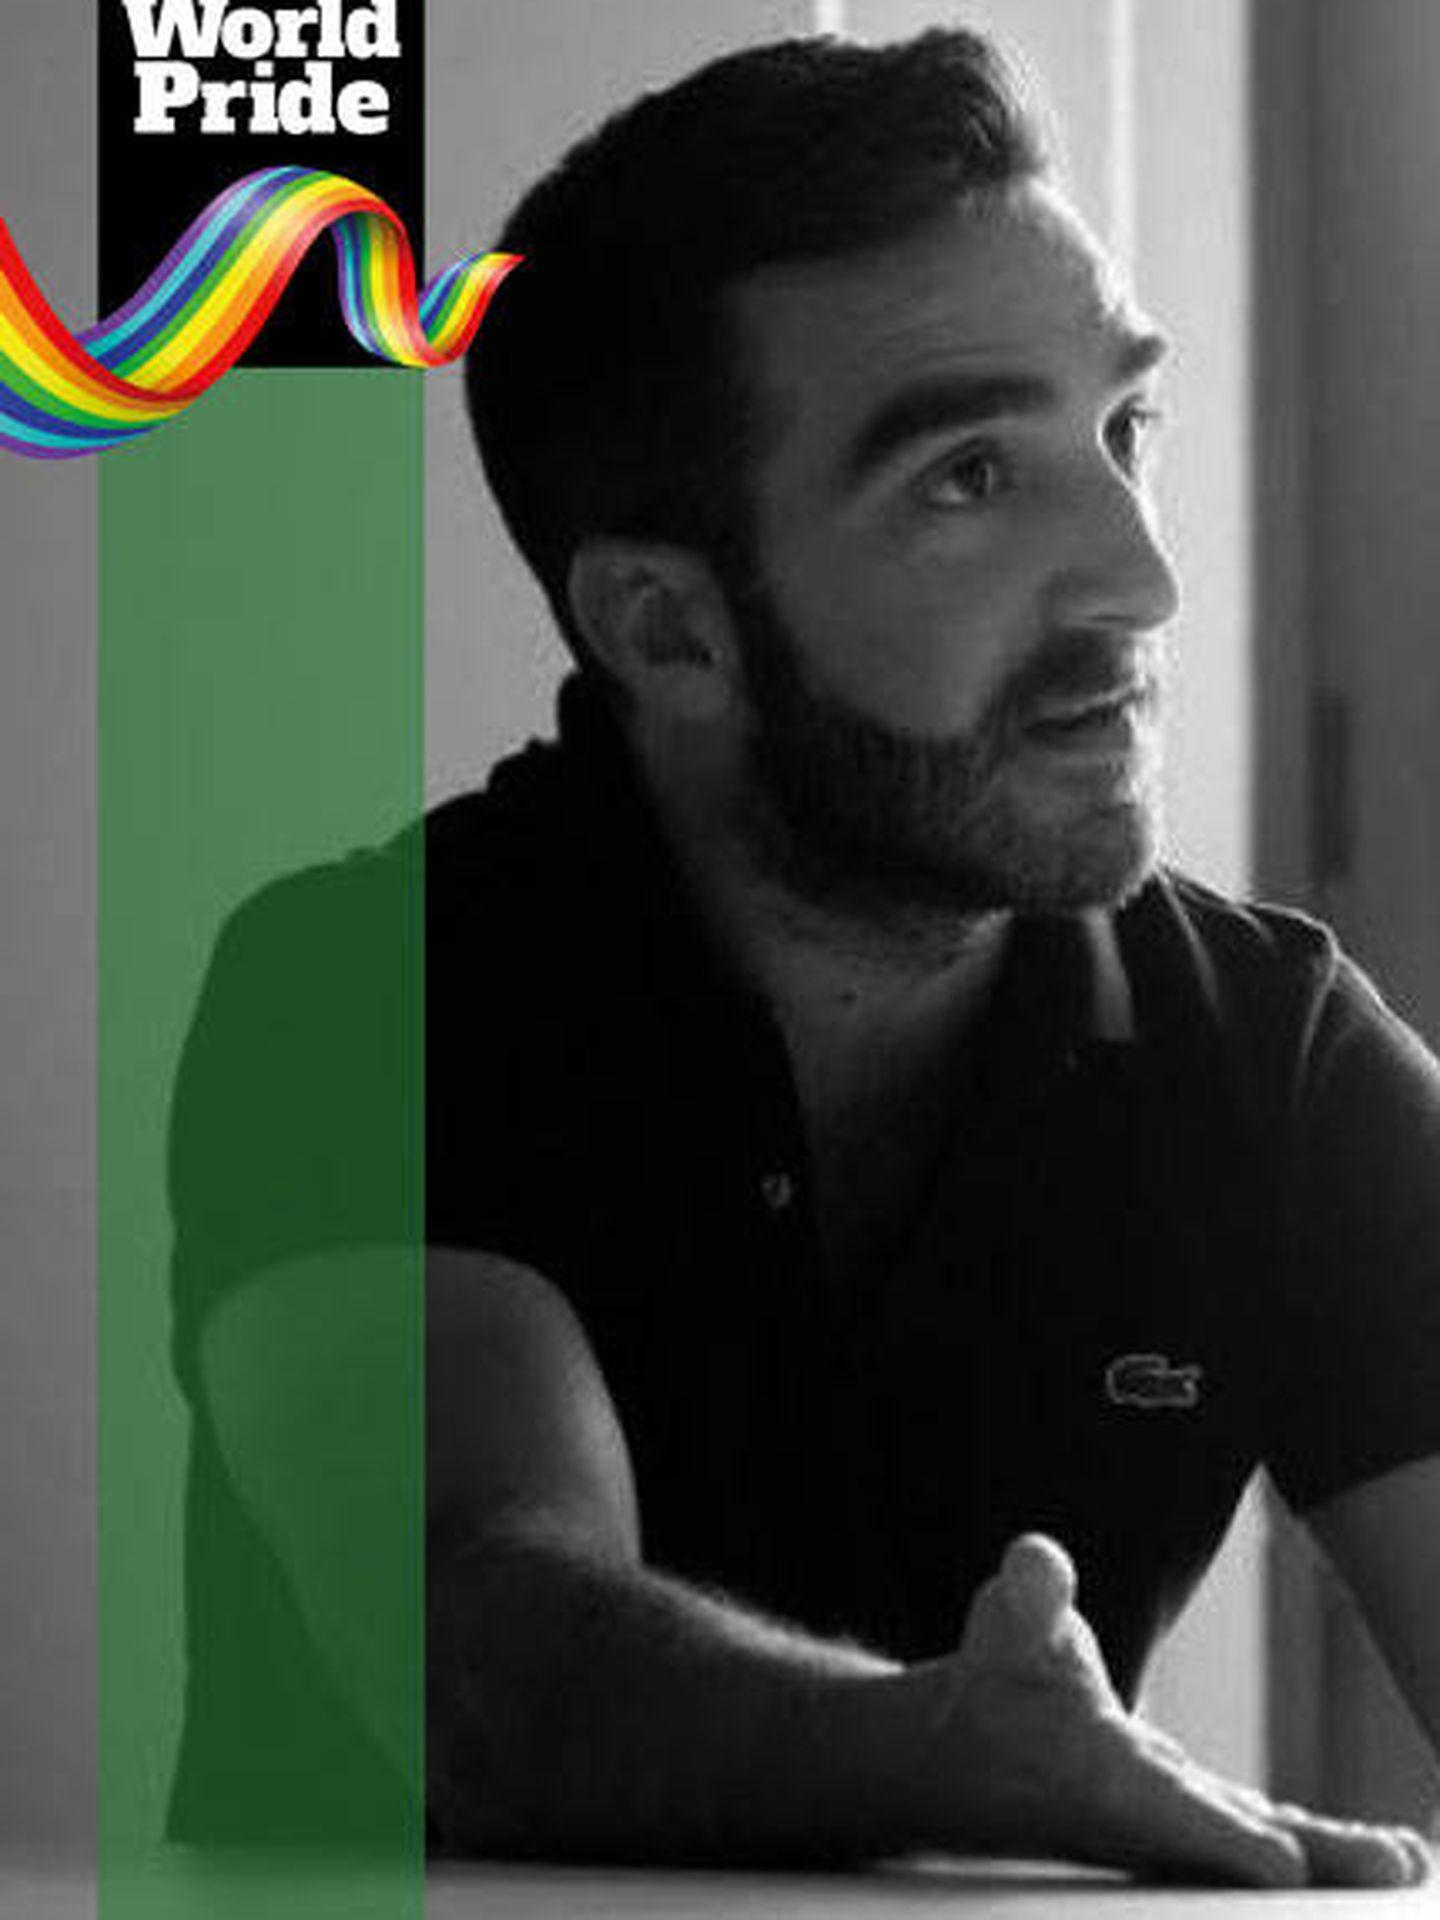 Orgullo LGTBI 2017: Francisco Polo.